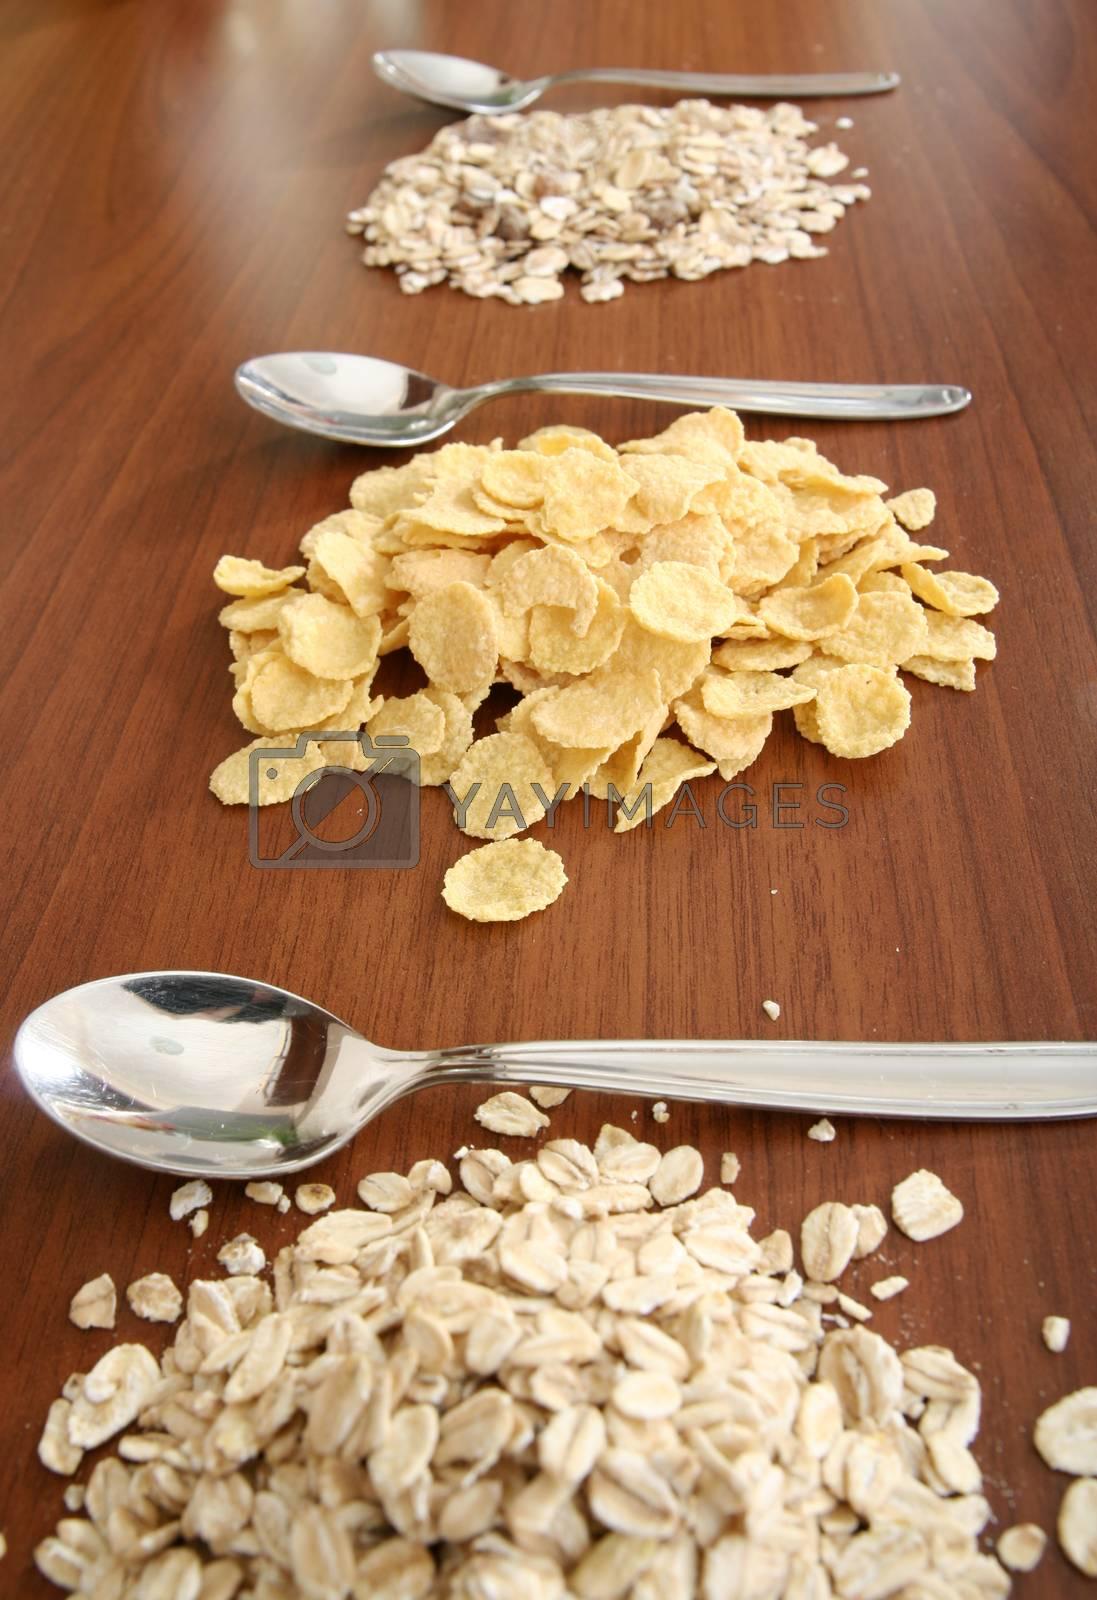 Corn flakes by arosoft